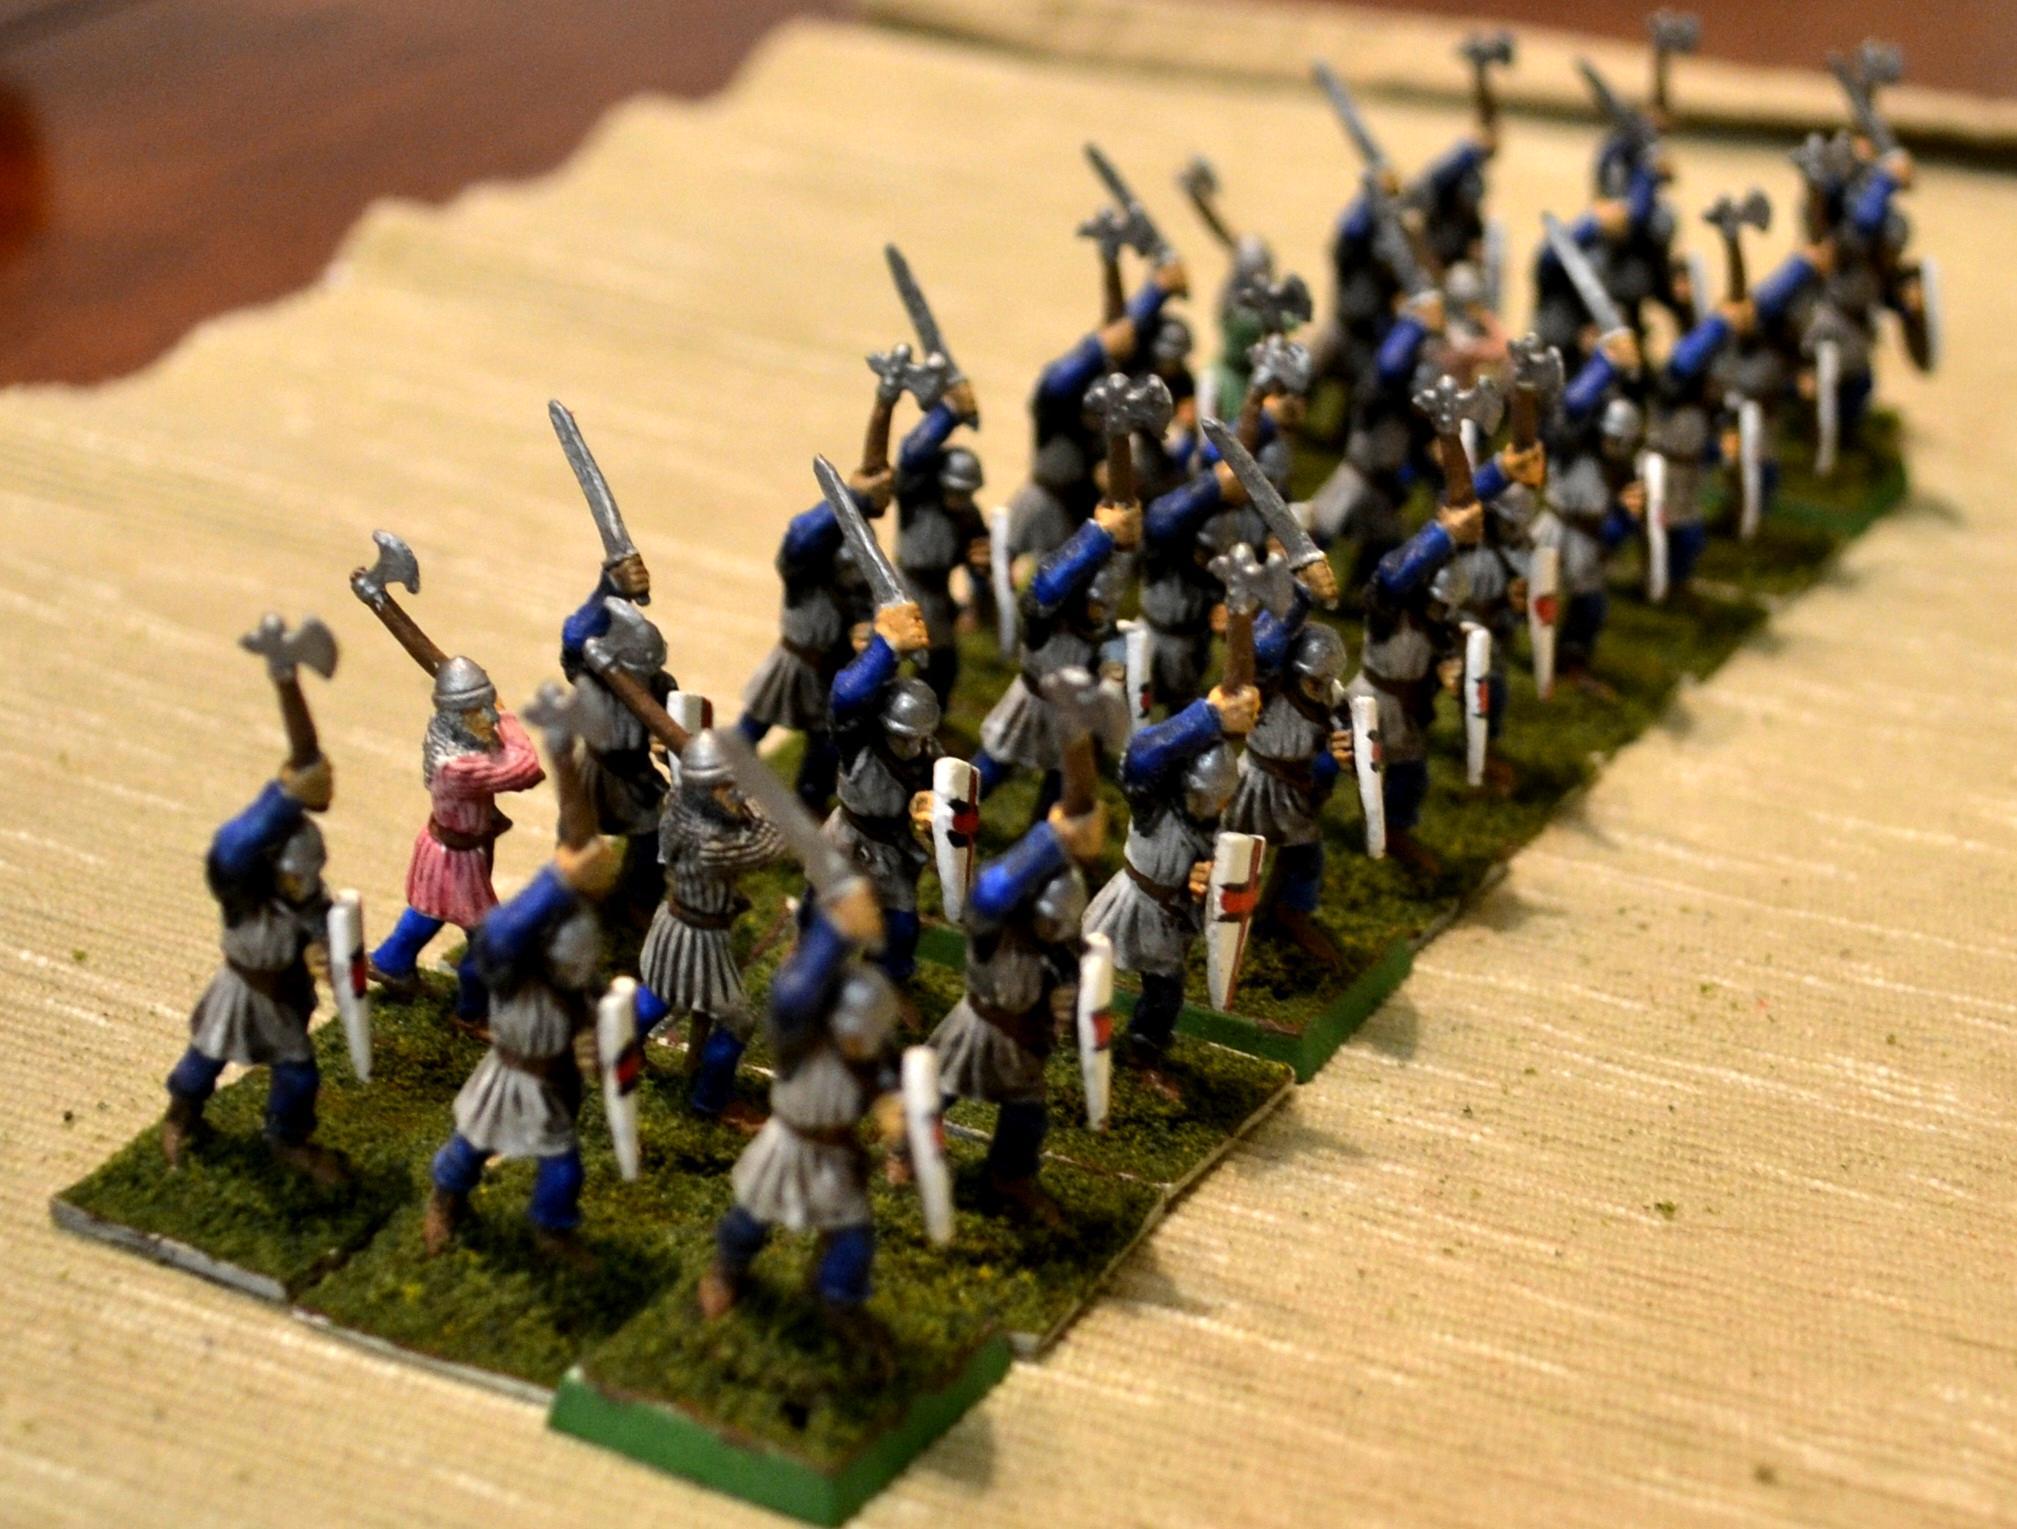 100 Years War, Men At Arms, Ral Partha, Wab